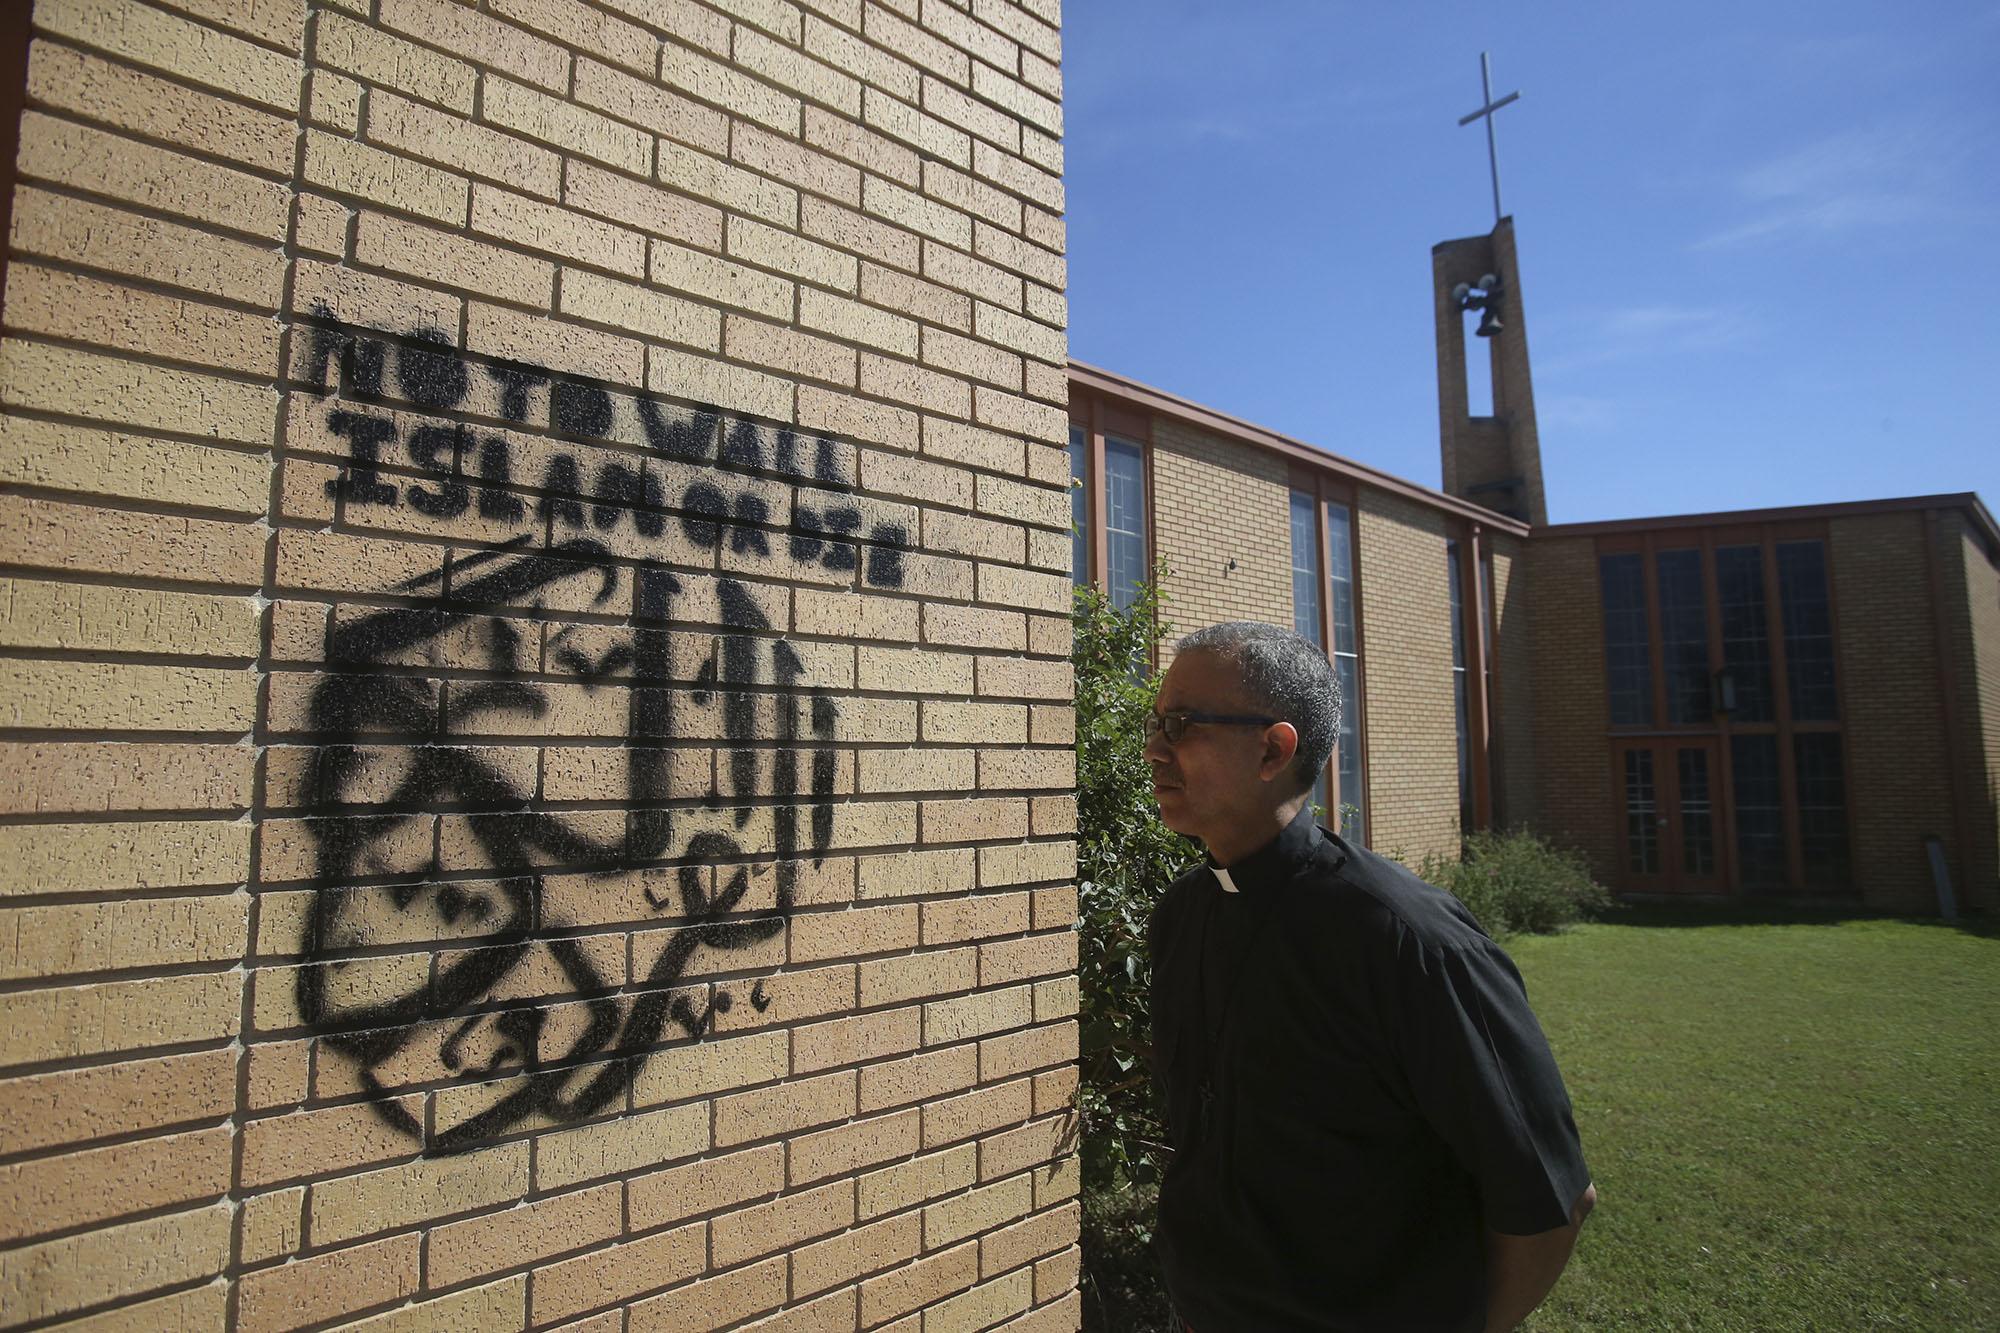 Graffiti Defaces San Antonio Church With No To Wall And